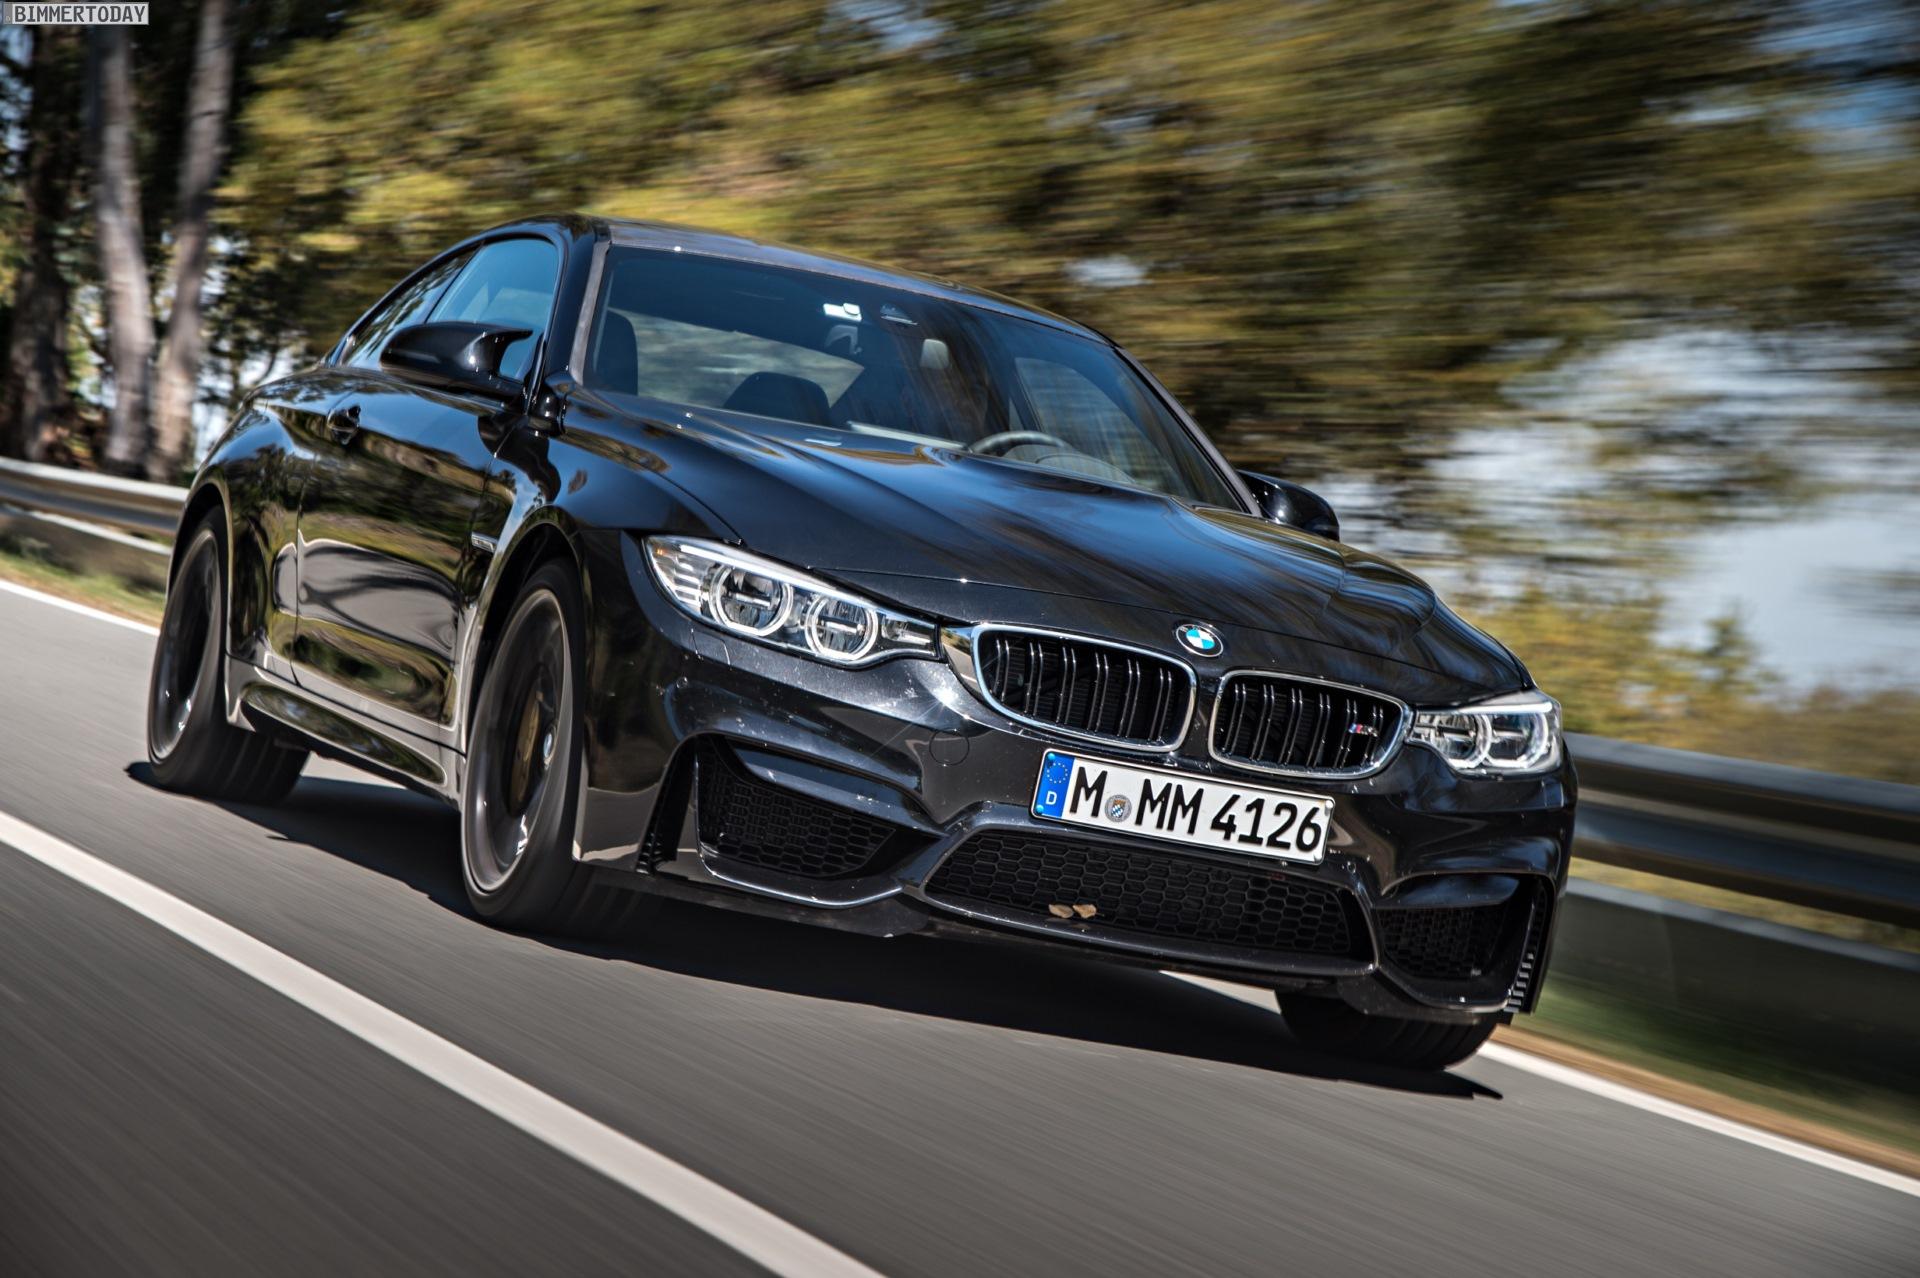 2014 Maserati Quattroporte >> BMW Cars - Wallpapers: BMW M4 Coupe in Sapphire Black